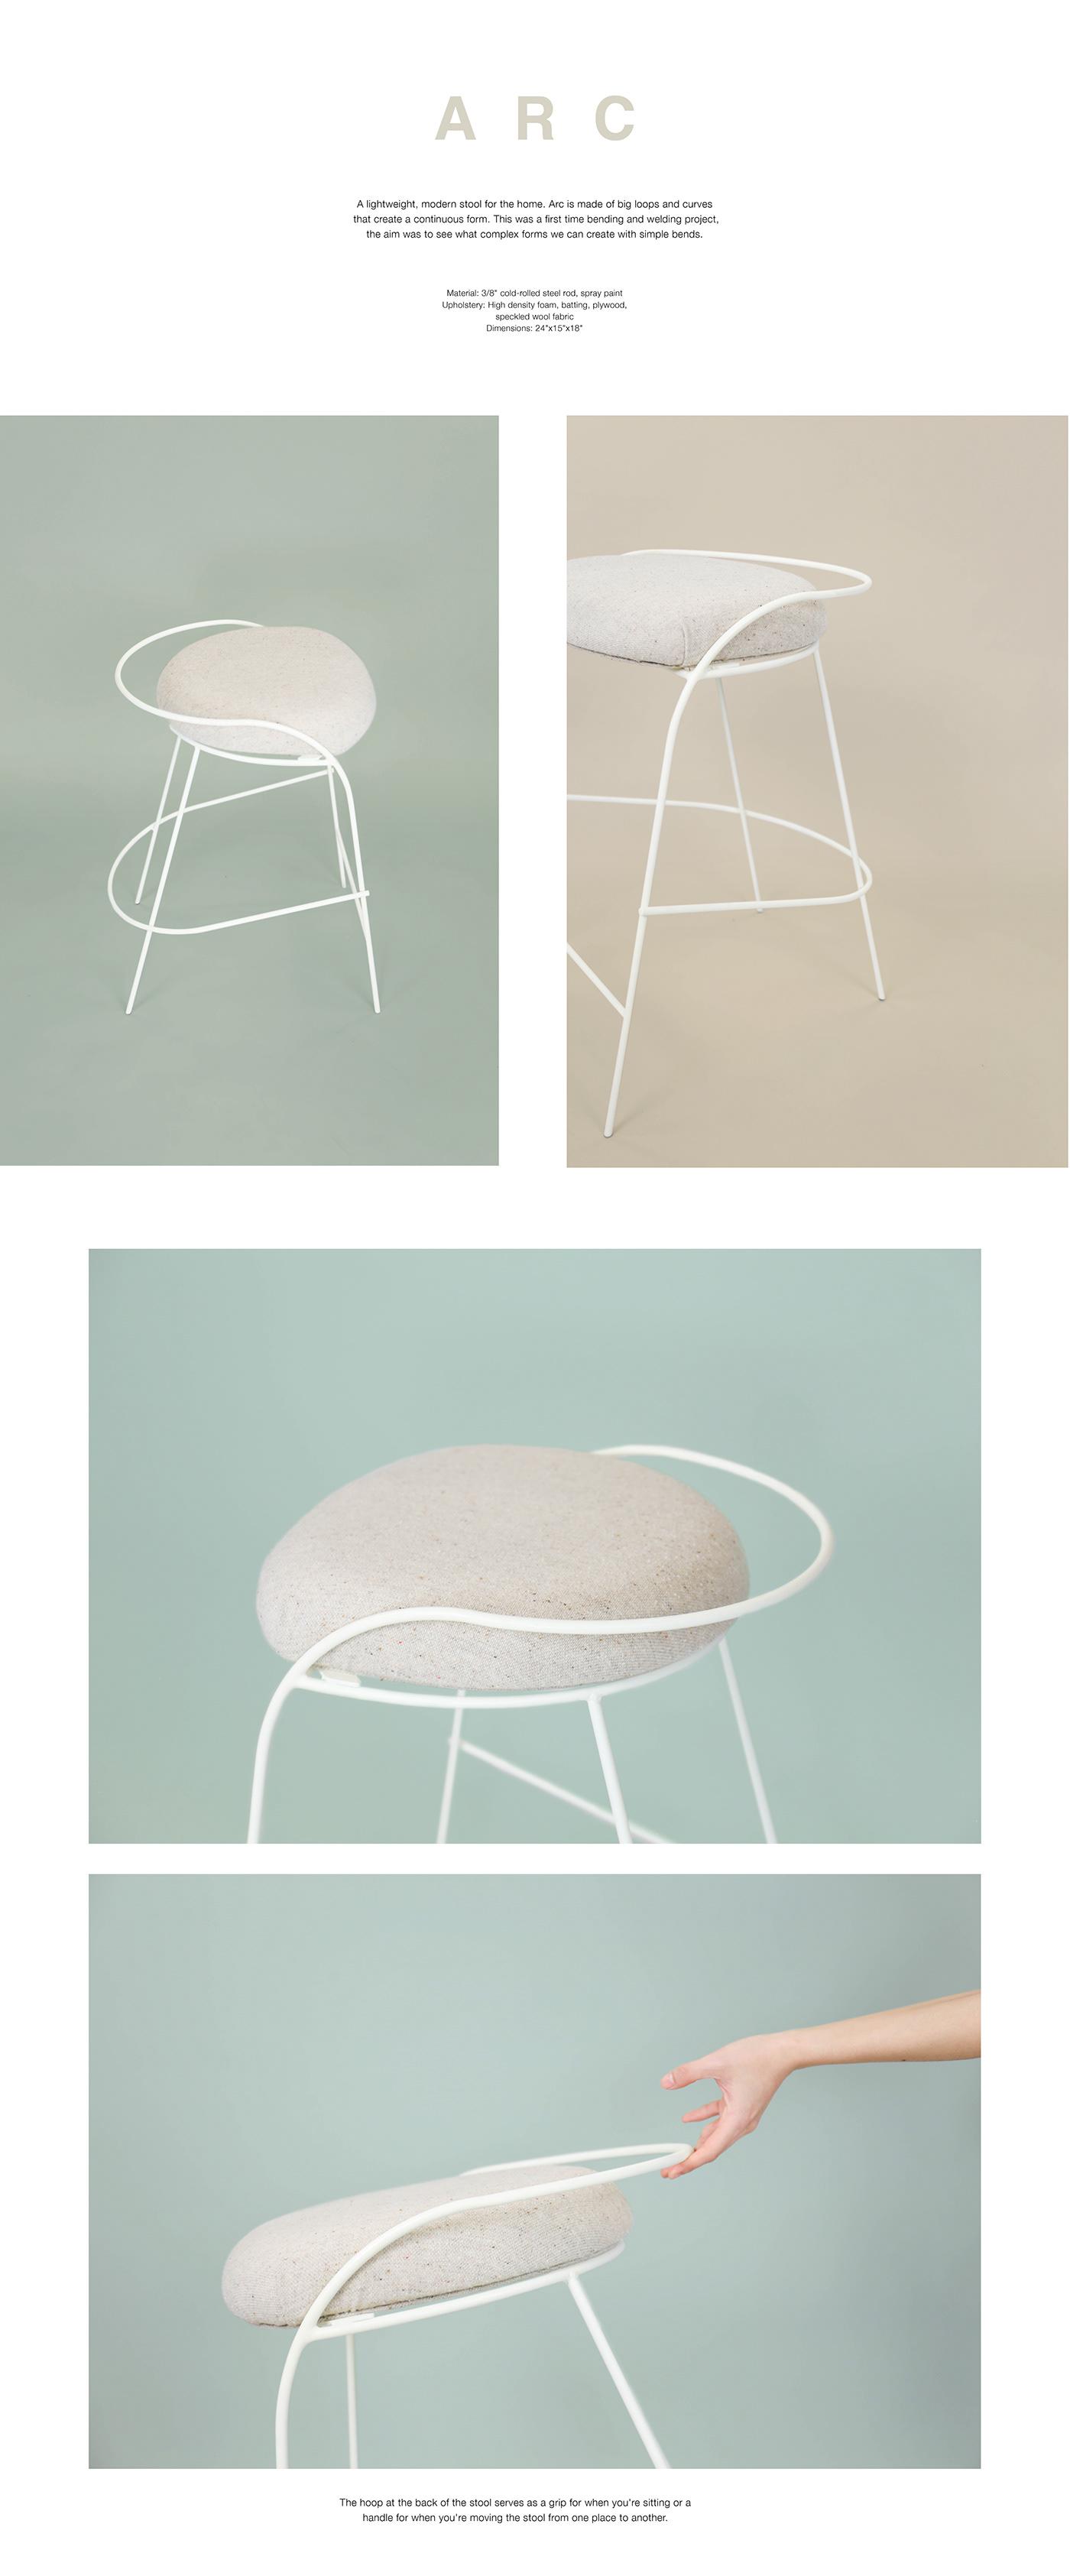 stool furniture industrial design  chair steel